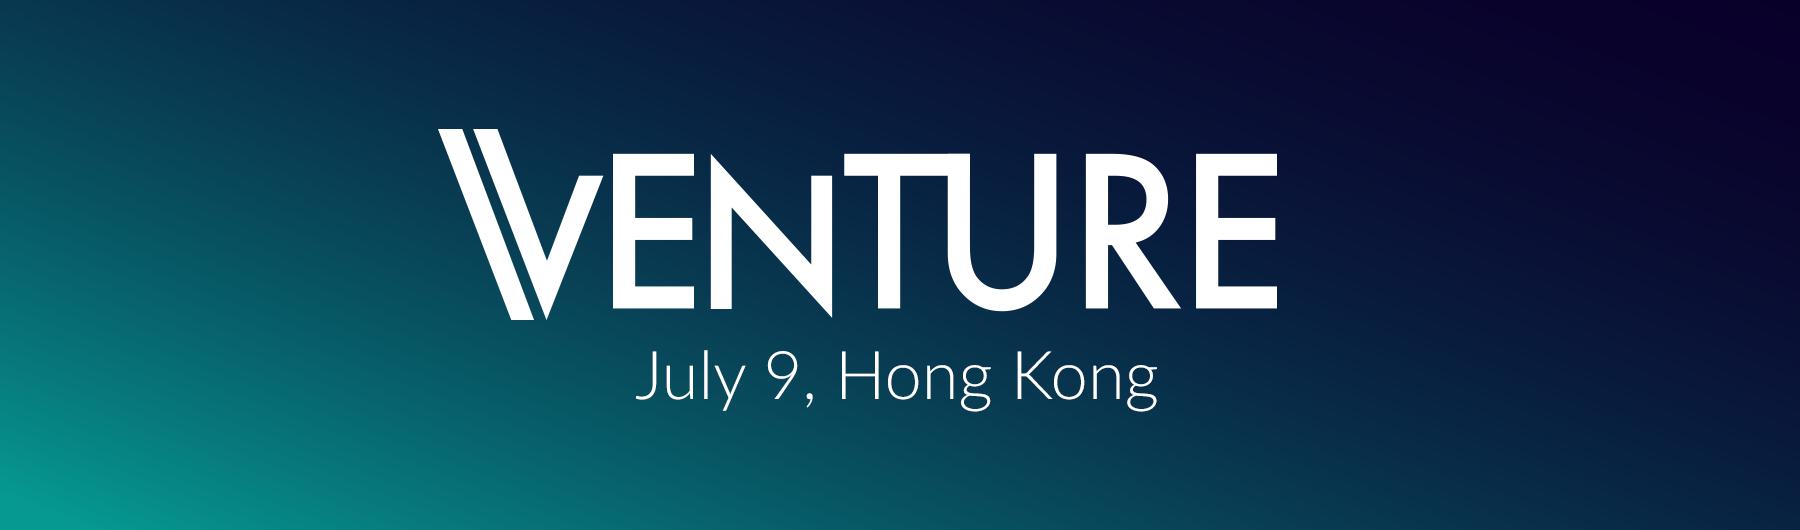 Venture HK 2018